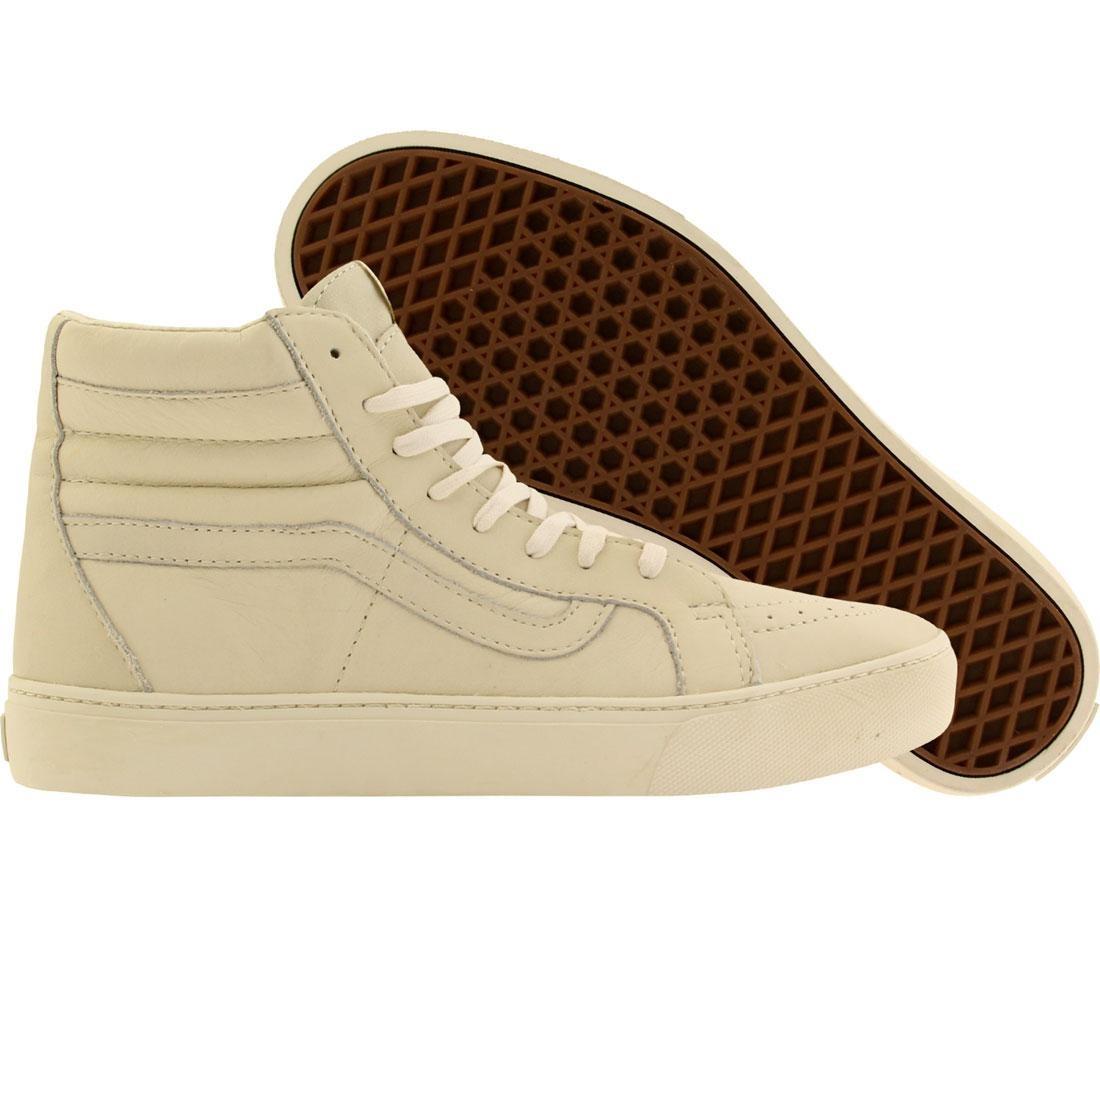 Vans Men Sk8-Hi Cup CA - Leather white